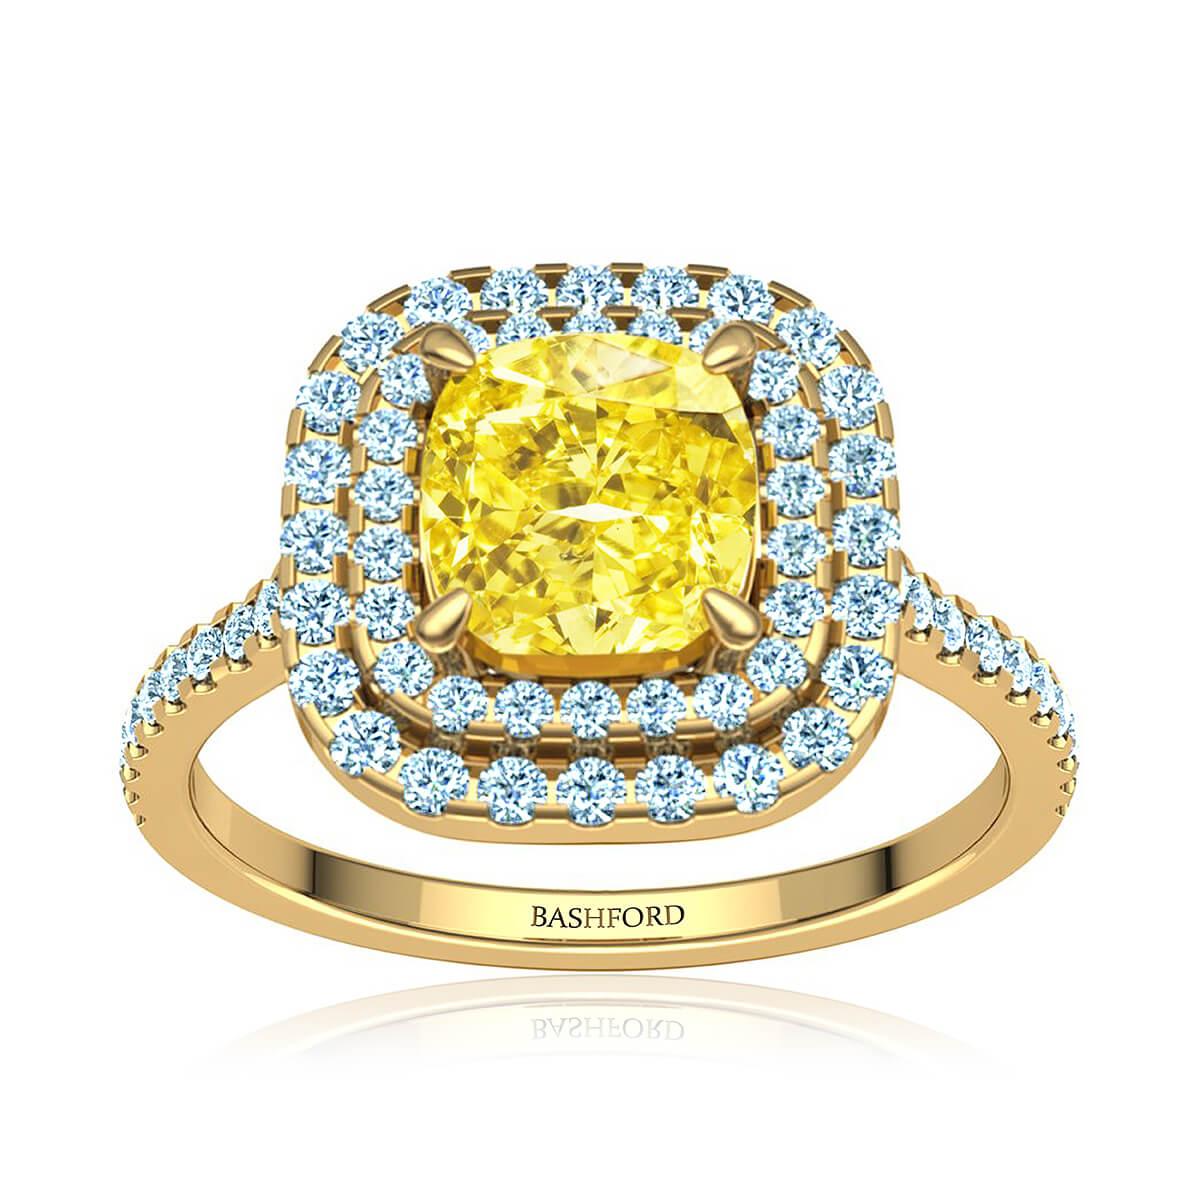 Marilou Yellow Moissanite Ring (with 2 1/2 Carat Cushion Moissanite)